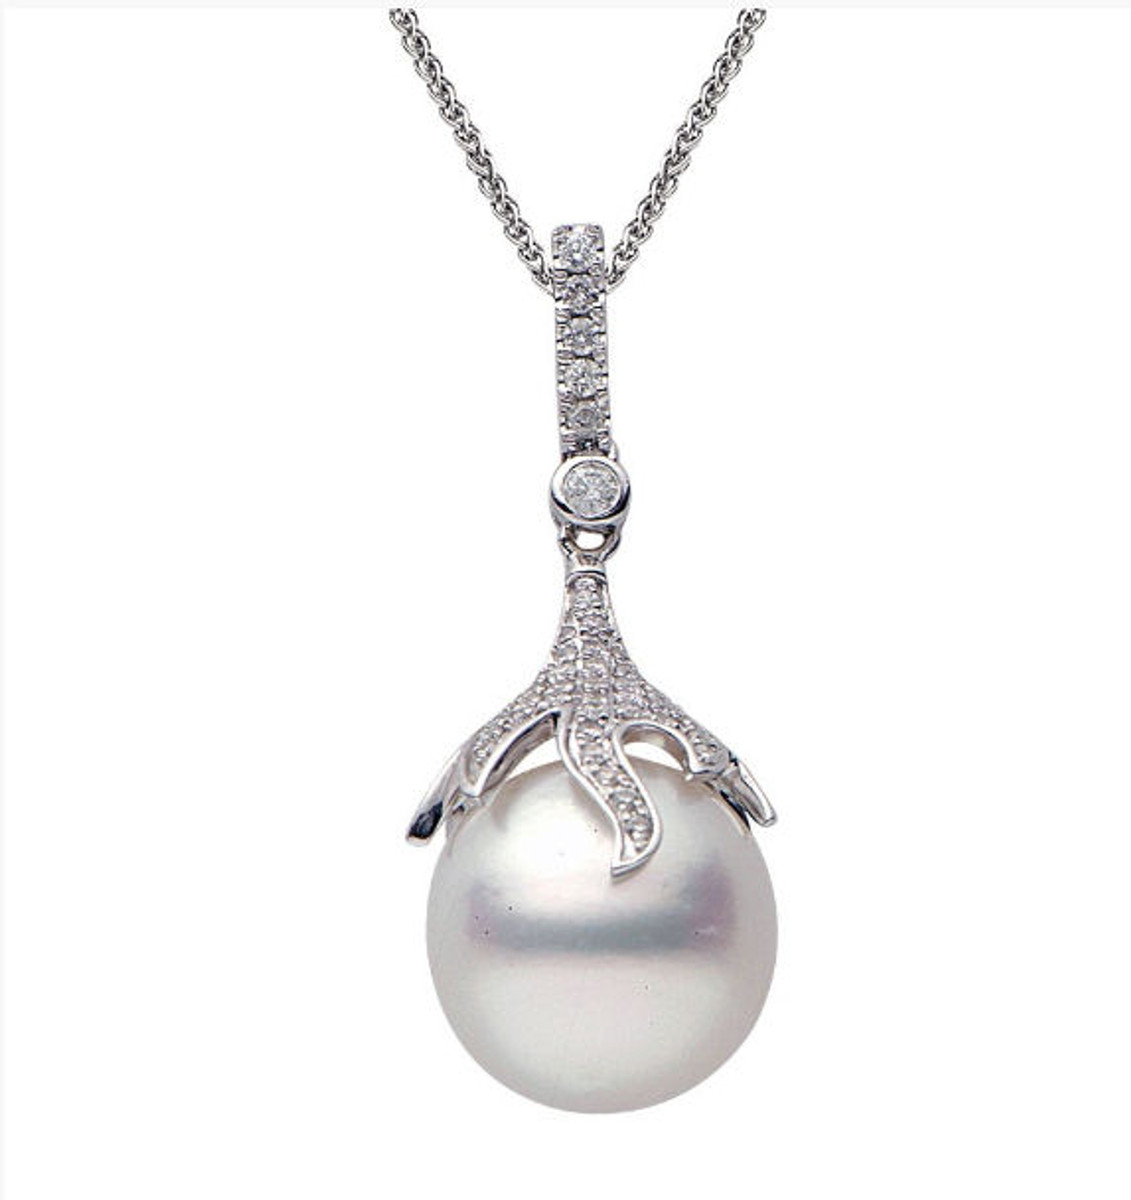 12-13 MM South Sea Cultured Pearl & Diamond Pendant